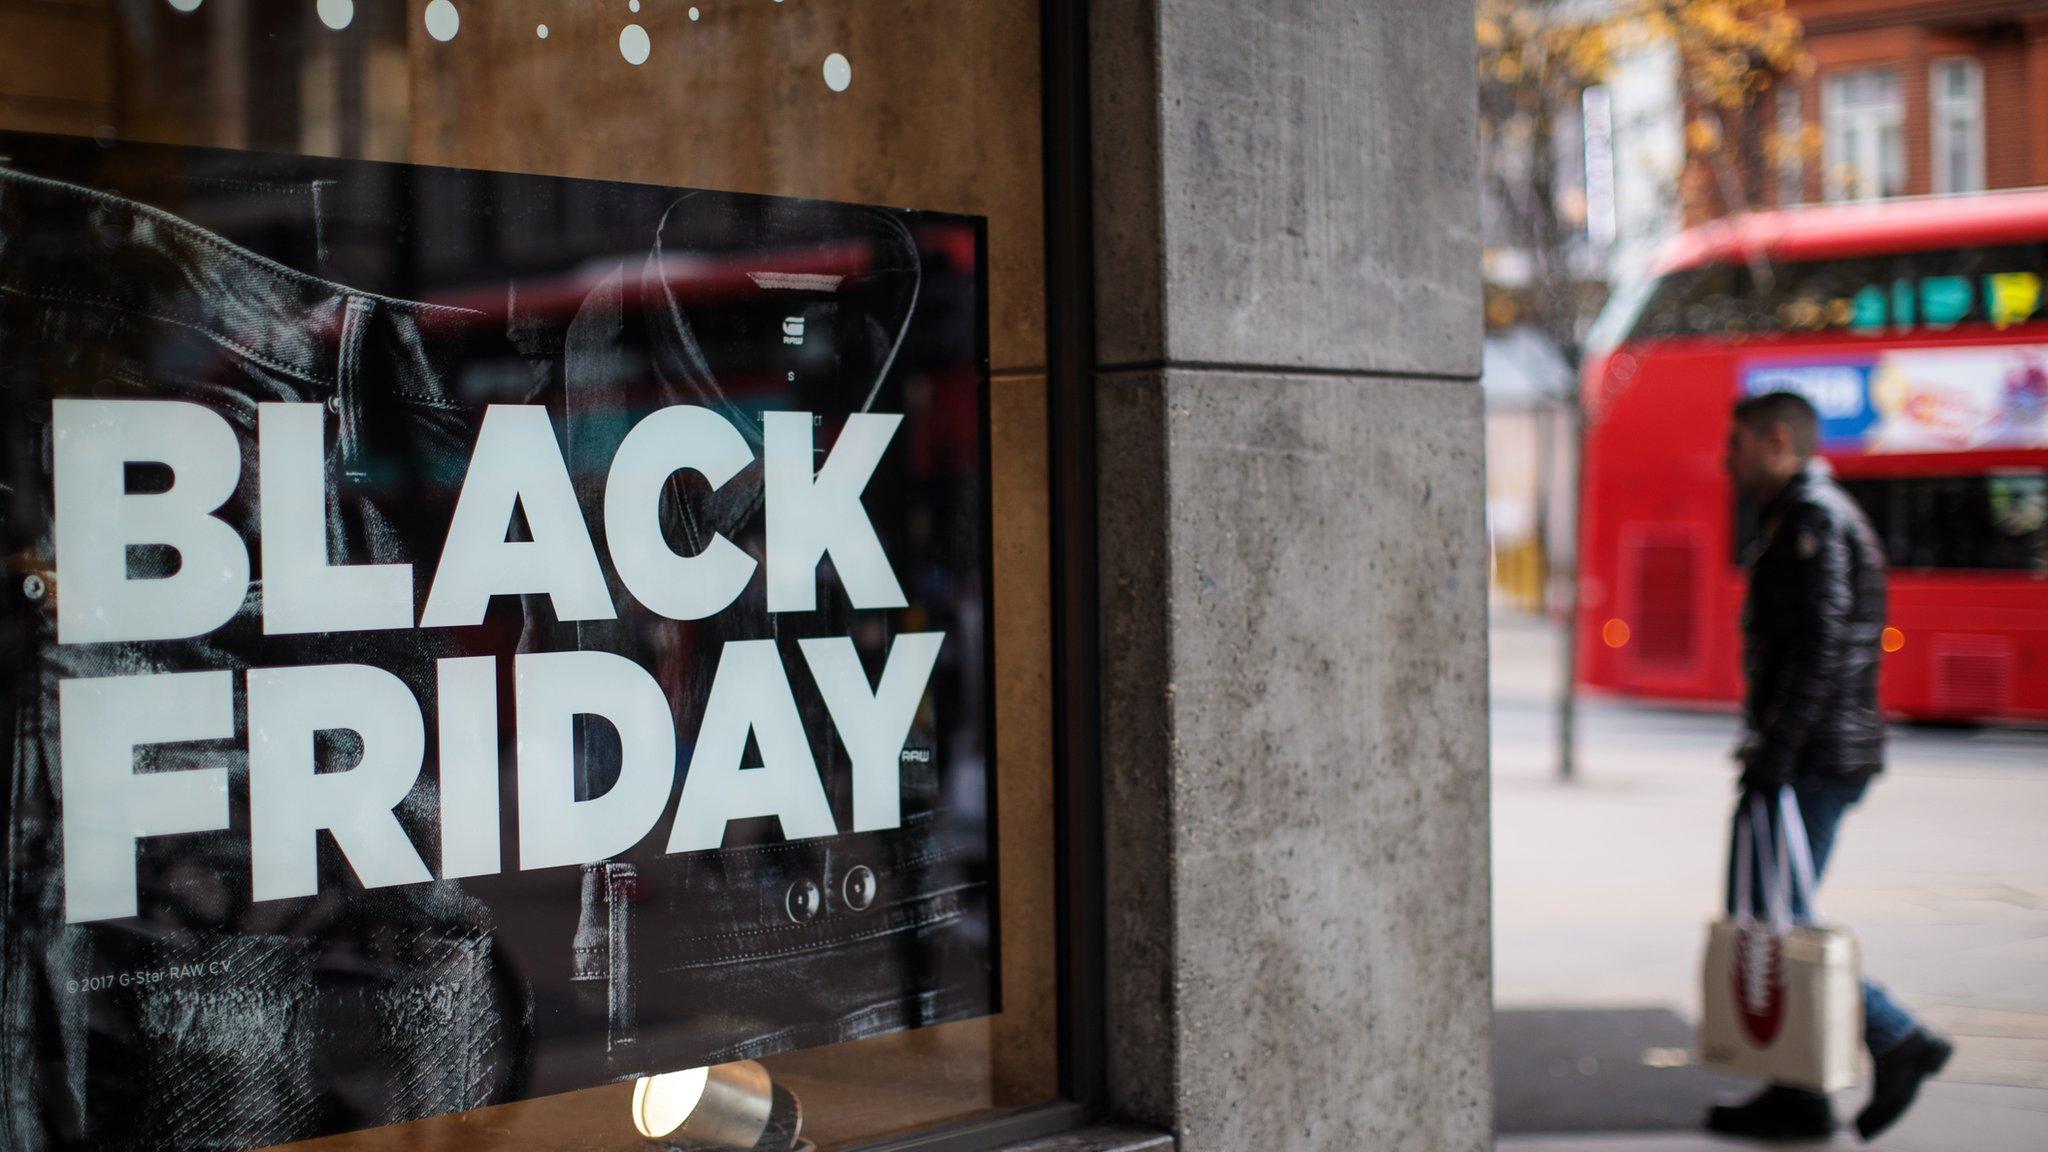 Black Friday sales bonanza set to hit a record